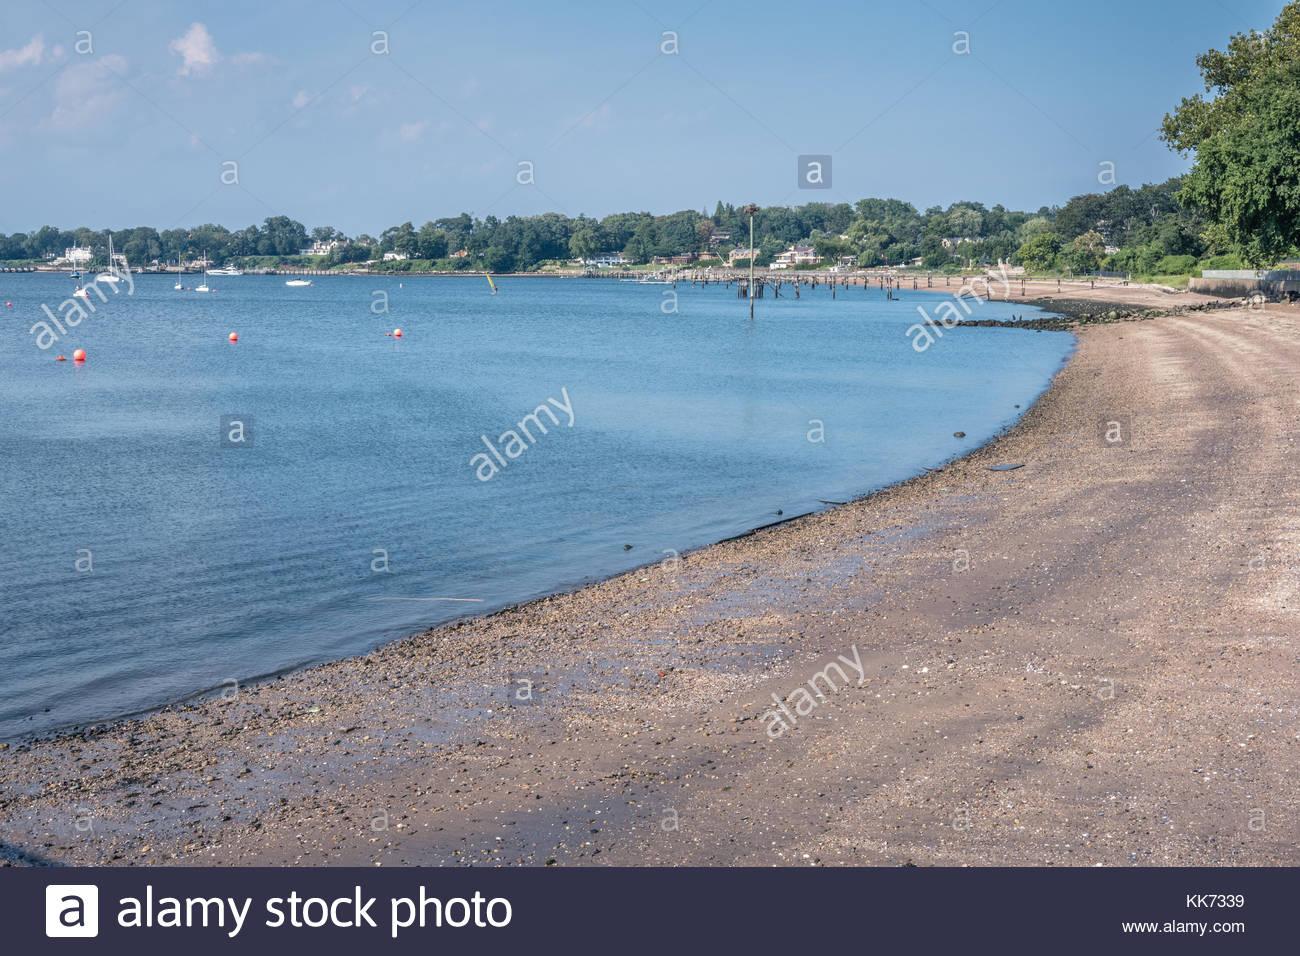 #ocean #nature #landscape #seascape #natural #sky #beach #peace #peaceful #sea #vacation #seaside #paradise #vacation - Stock Image